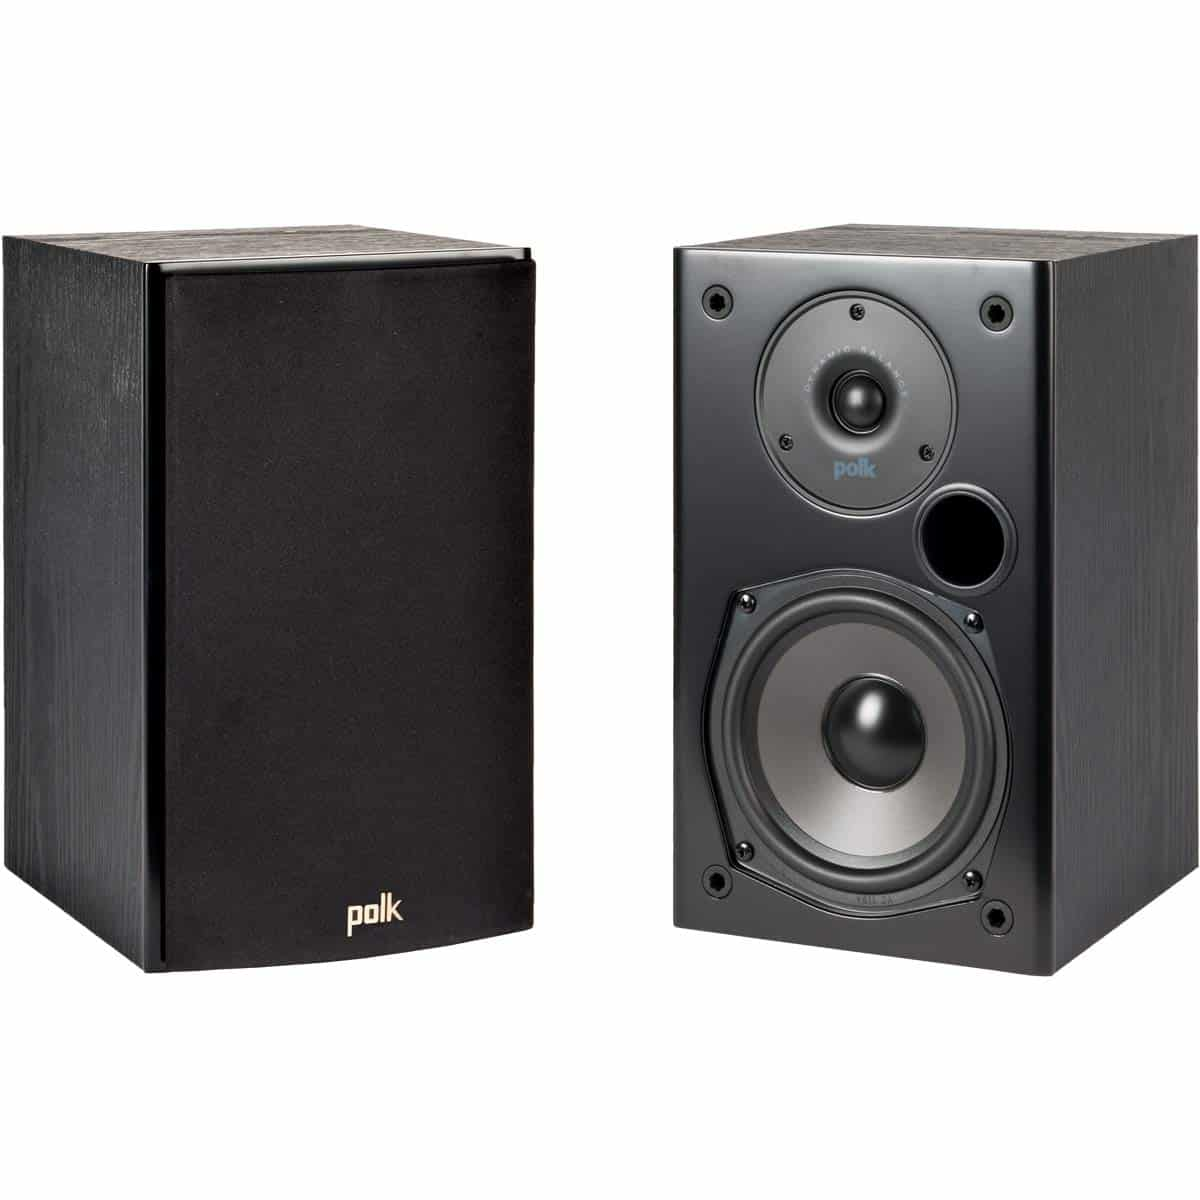 Polk Audio T15 100-Watt Bookshelf Speakers